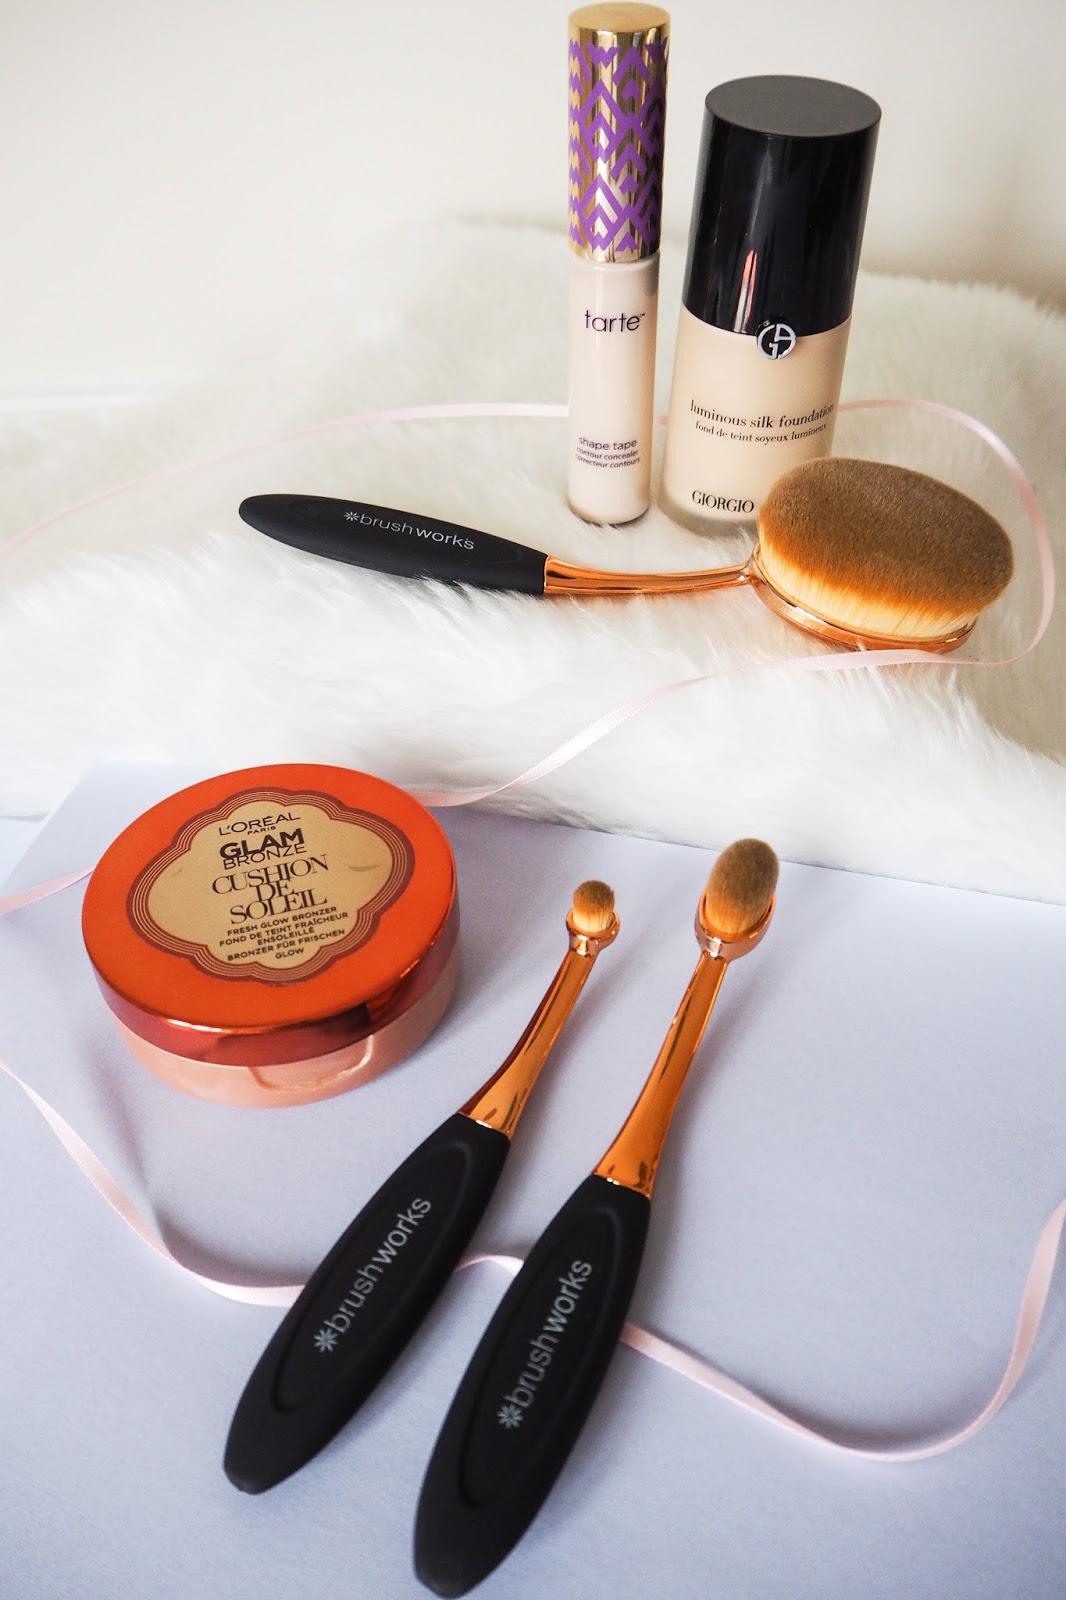 Makeup brushes and makeup set up for a photo